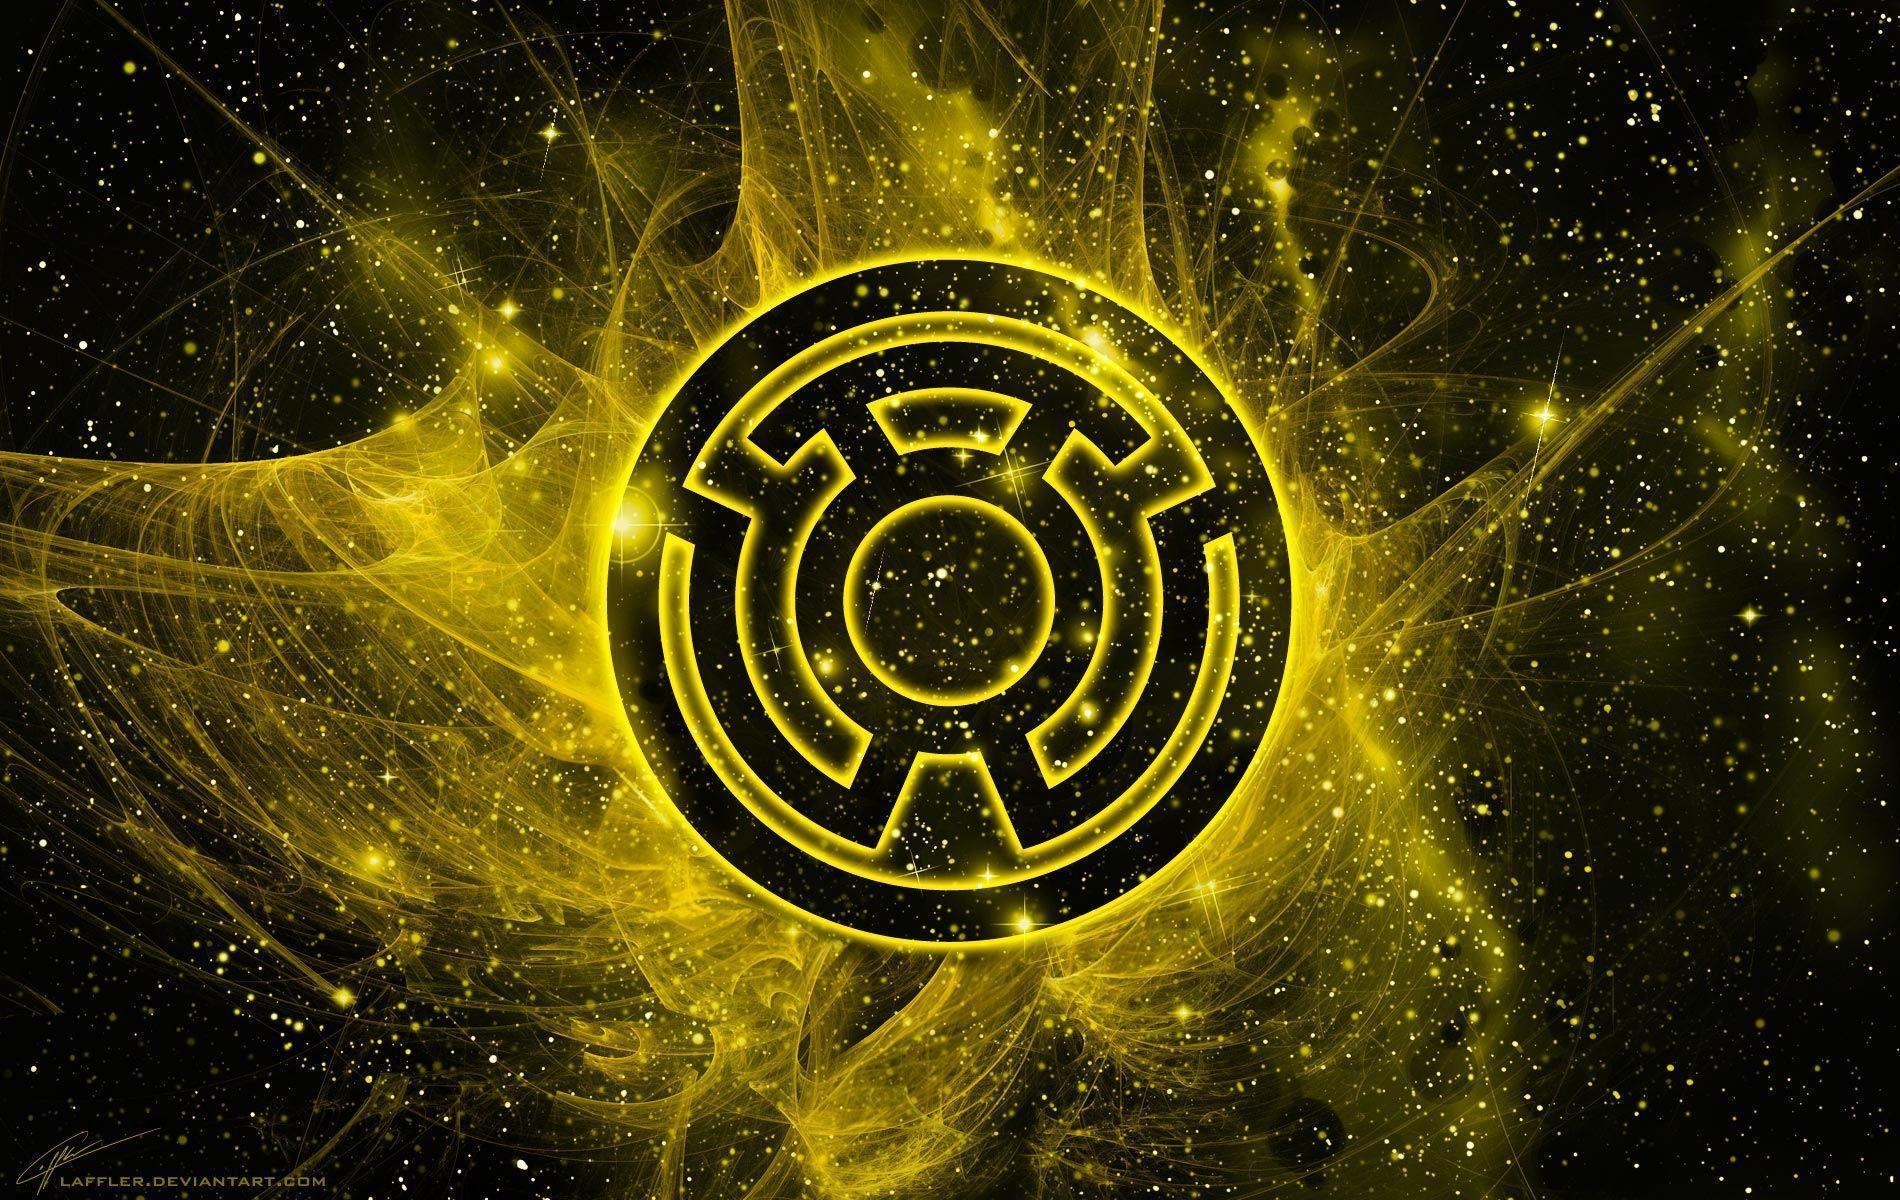 Sinestro Corps Wallpapers by Laffler on DeviantArt